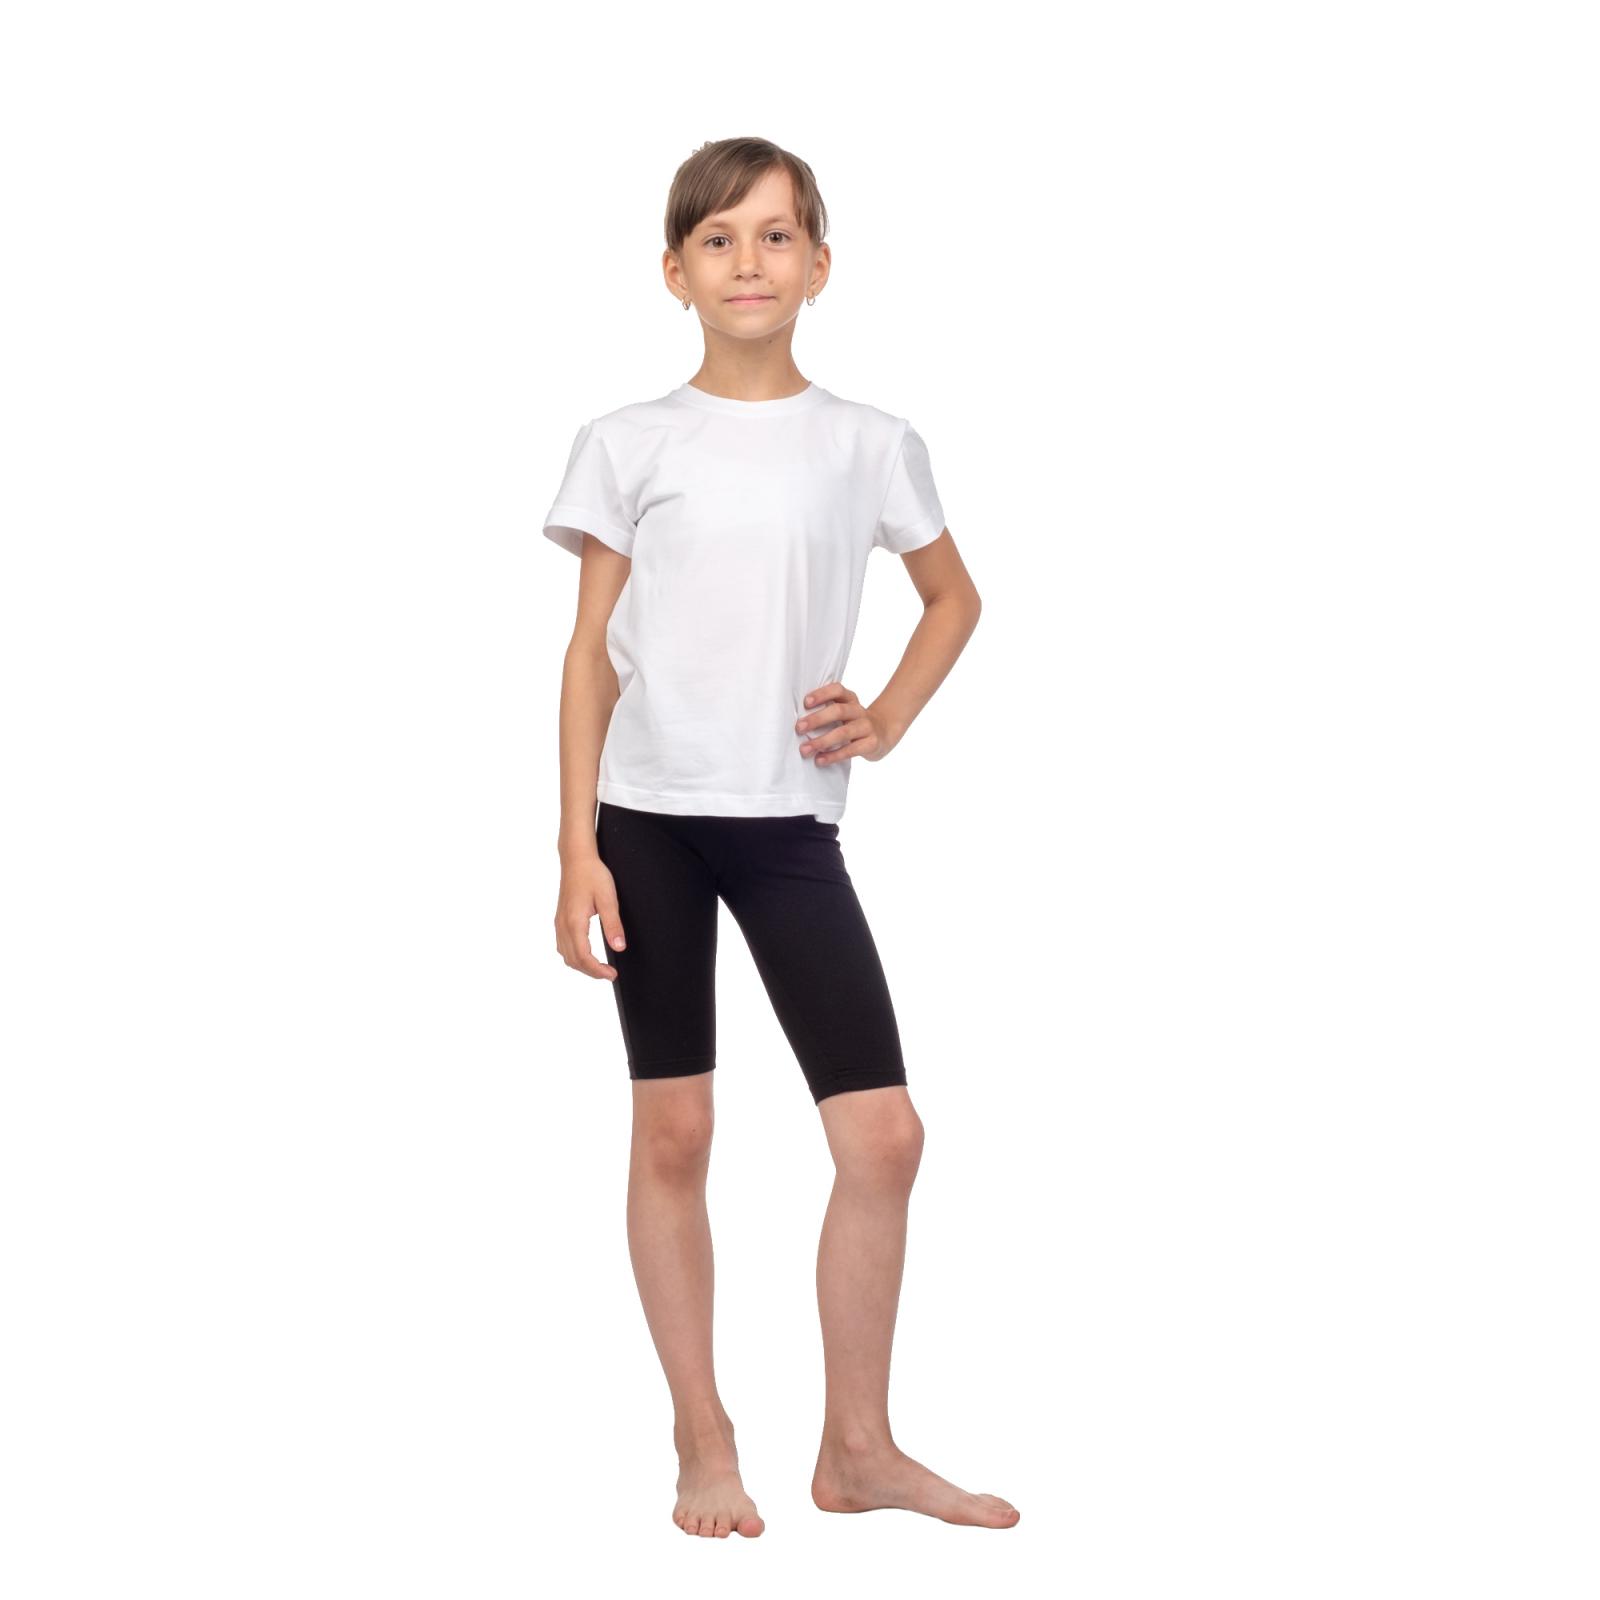 Футболка детская белая Д-0001Б